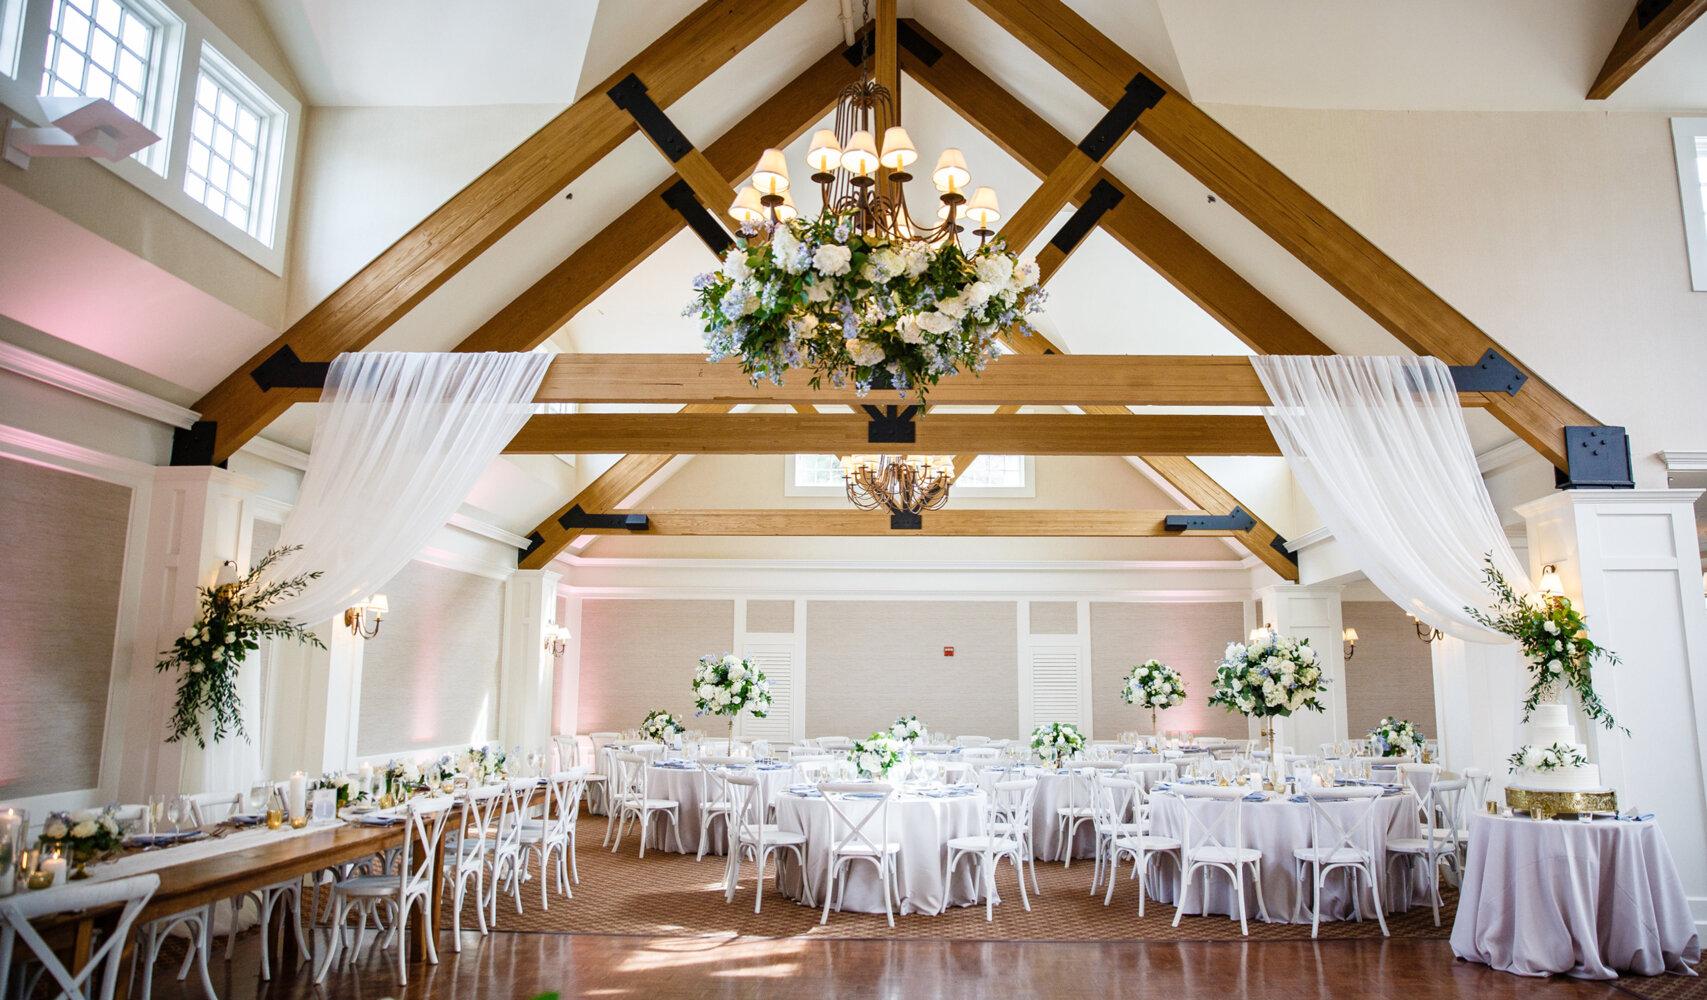 Pinehills-Pavilion-Wedding-Reception-Details.jpg